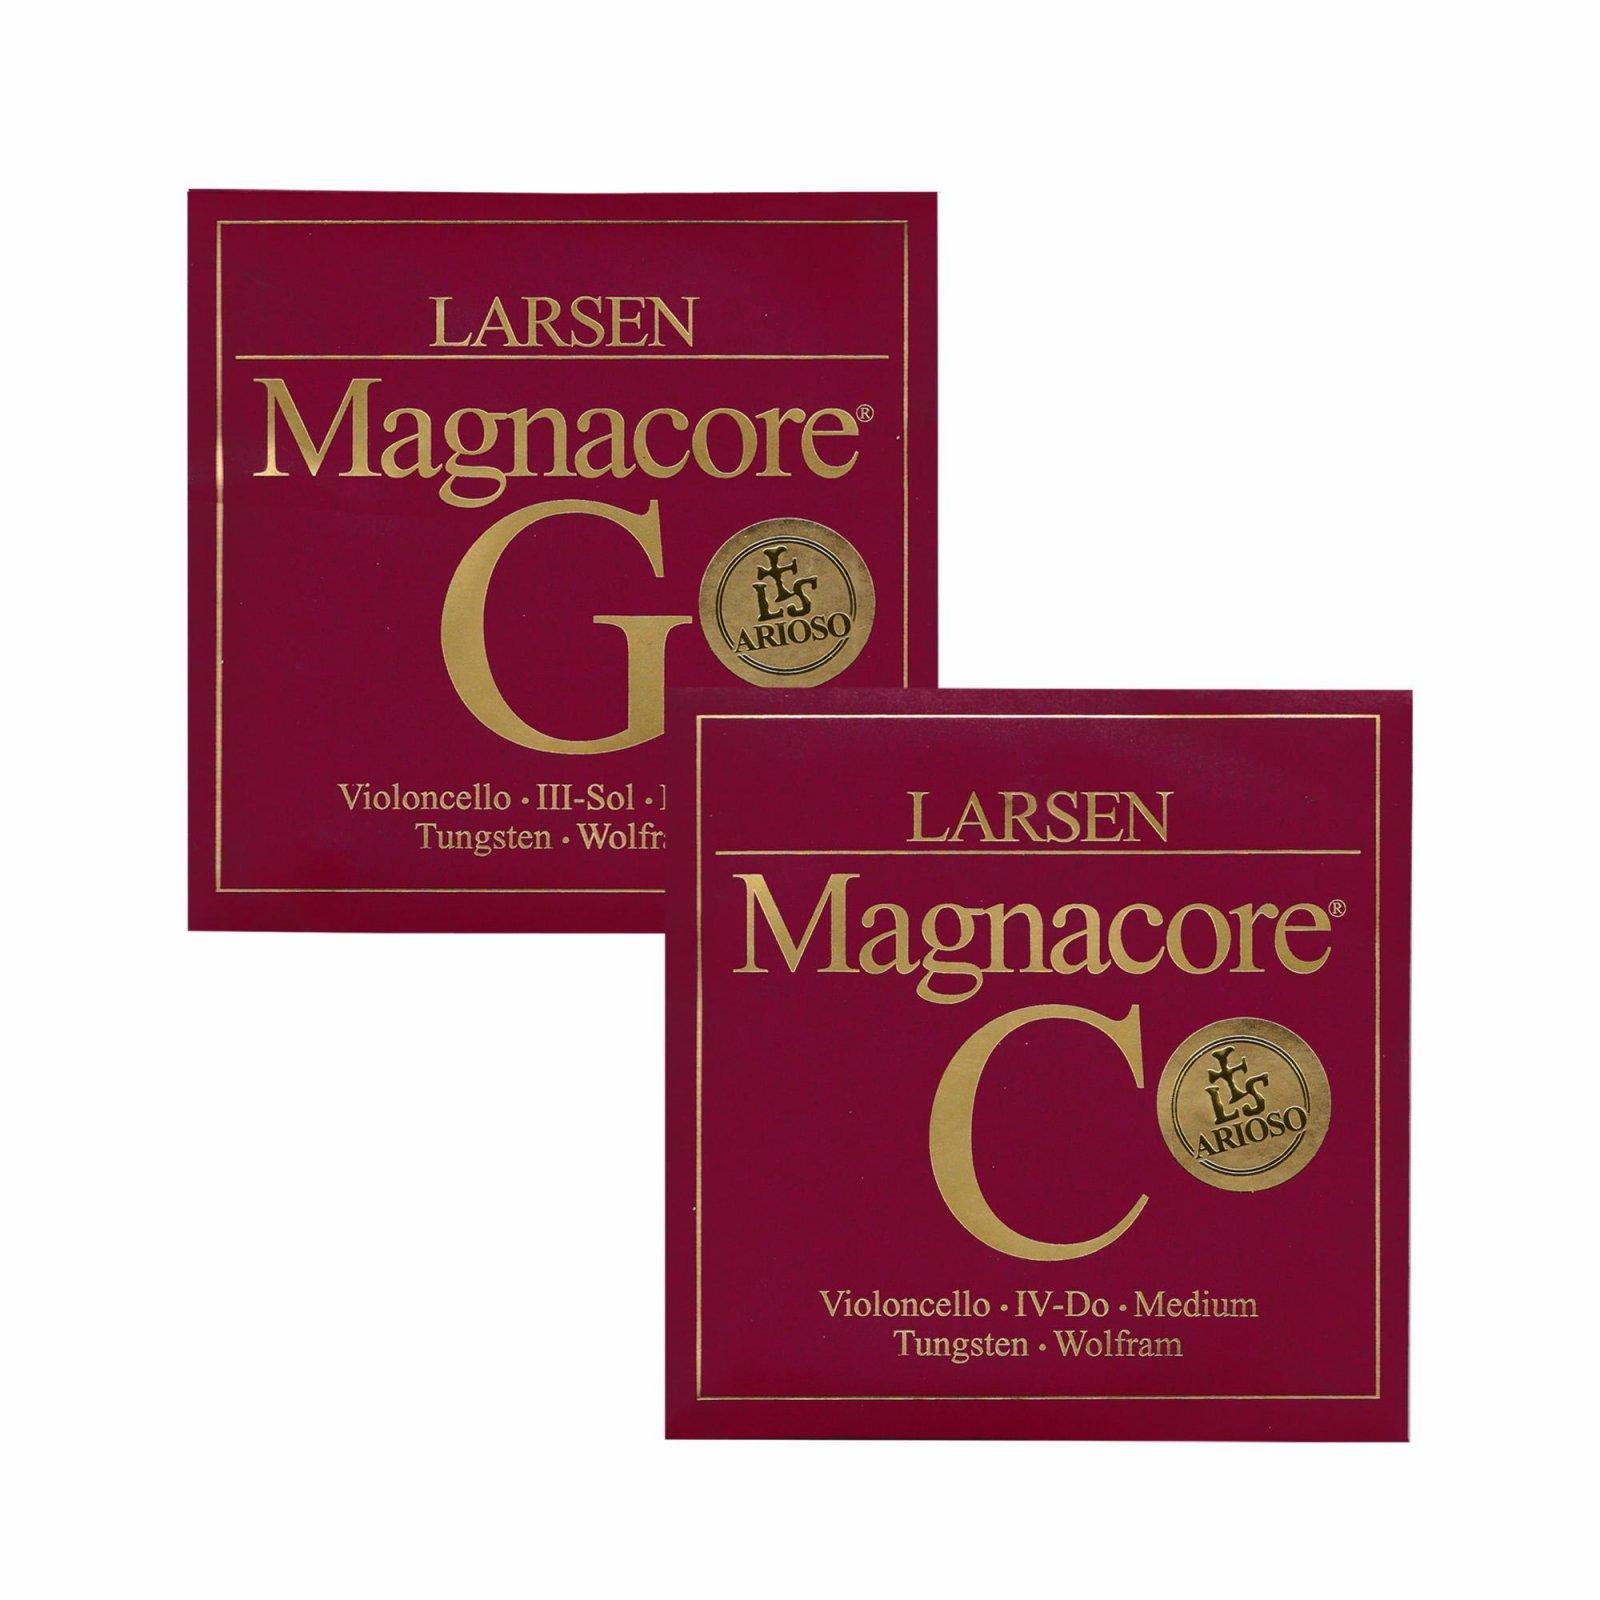 Larsen Magnacore Arioso Cello A